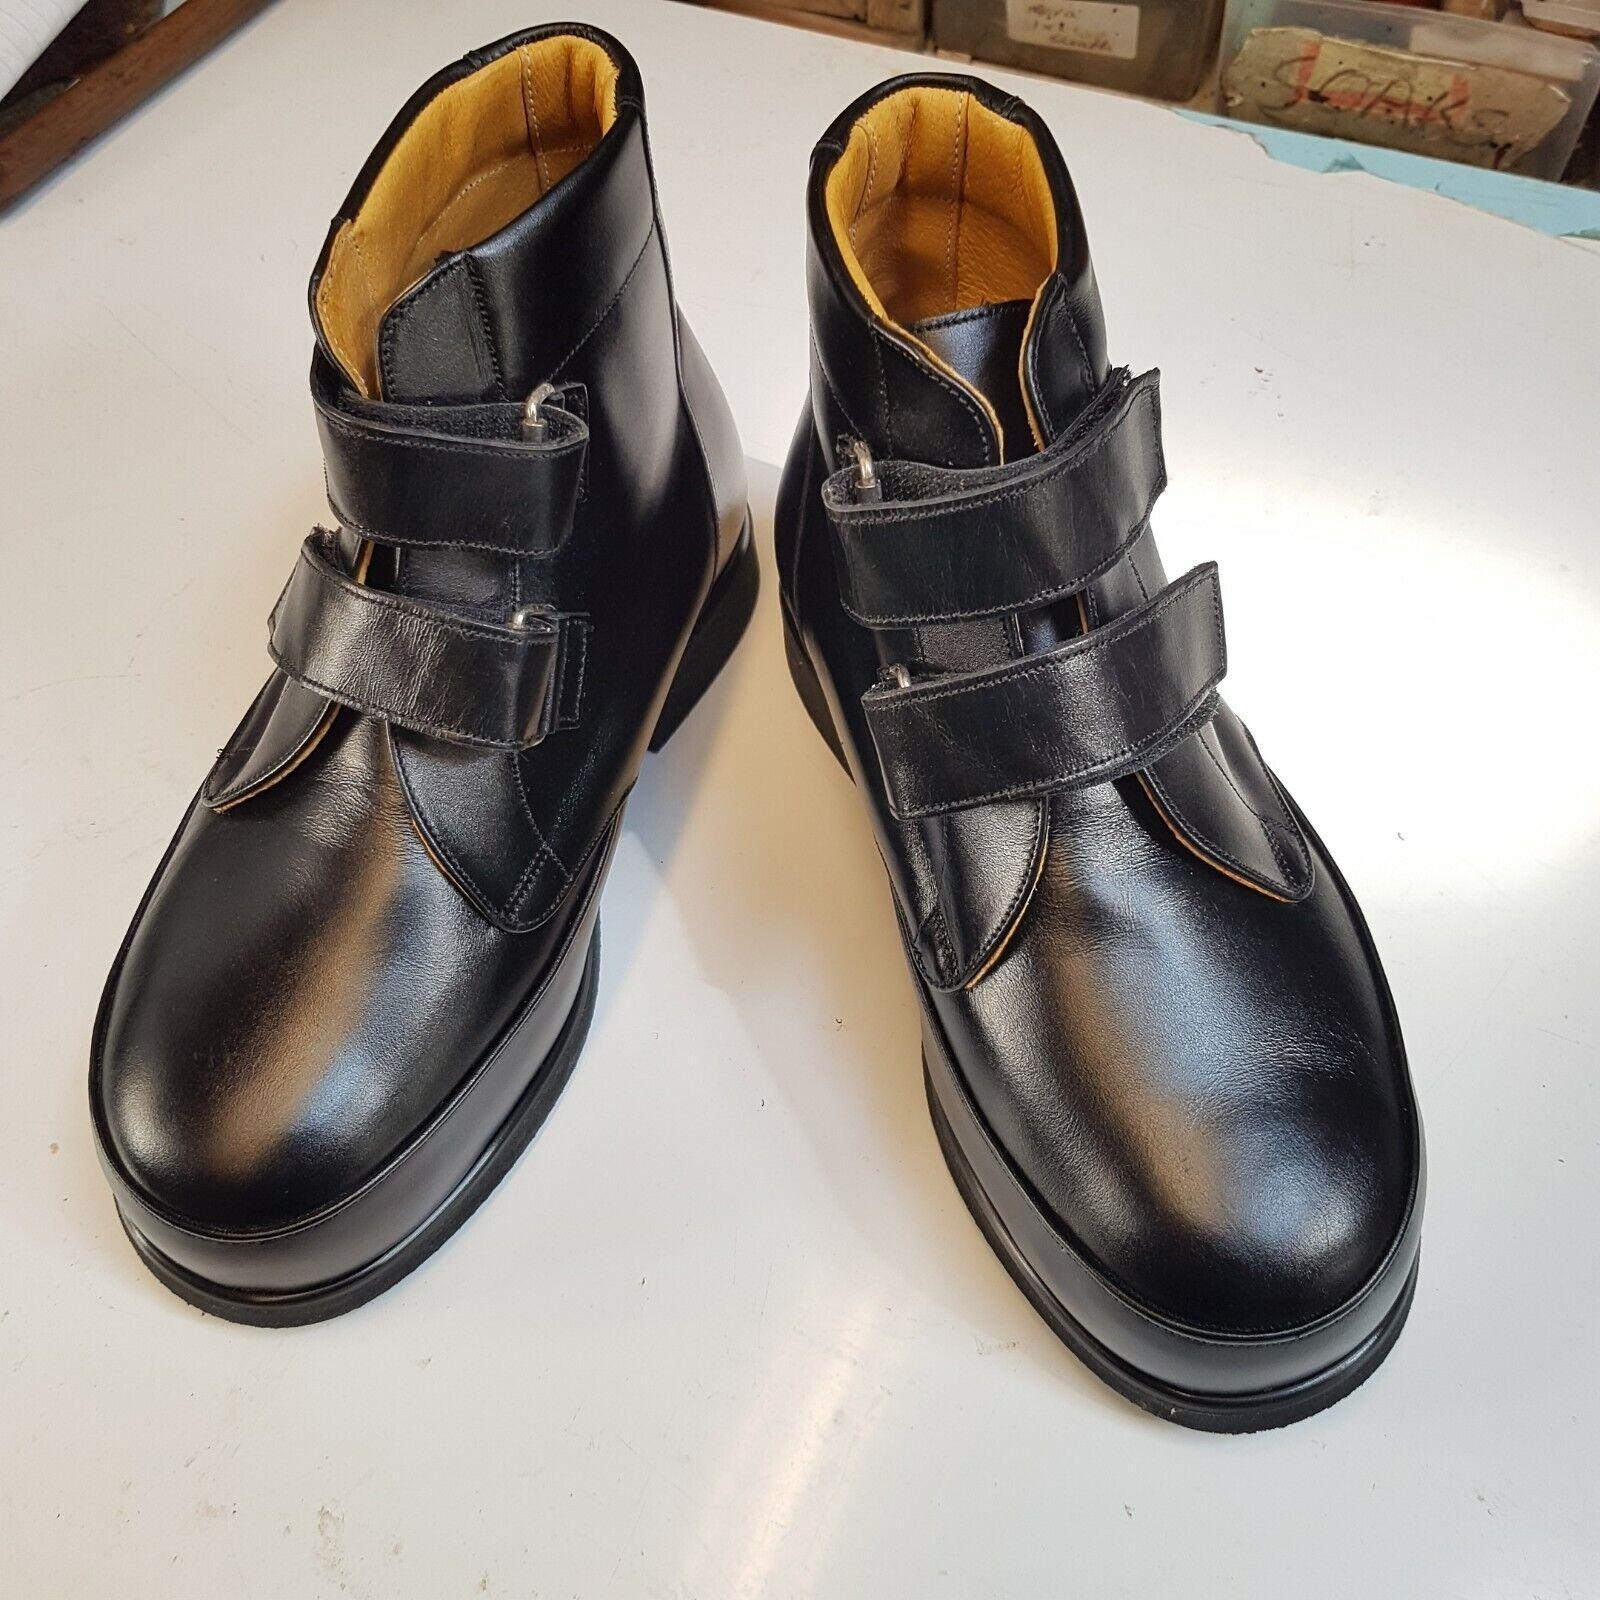 B1 Men Size 5 Black Leather Boots Wide & Deep Fit Comfy Medical Slip-On Shoes